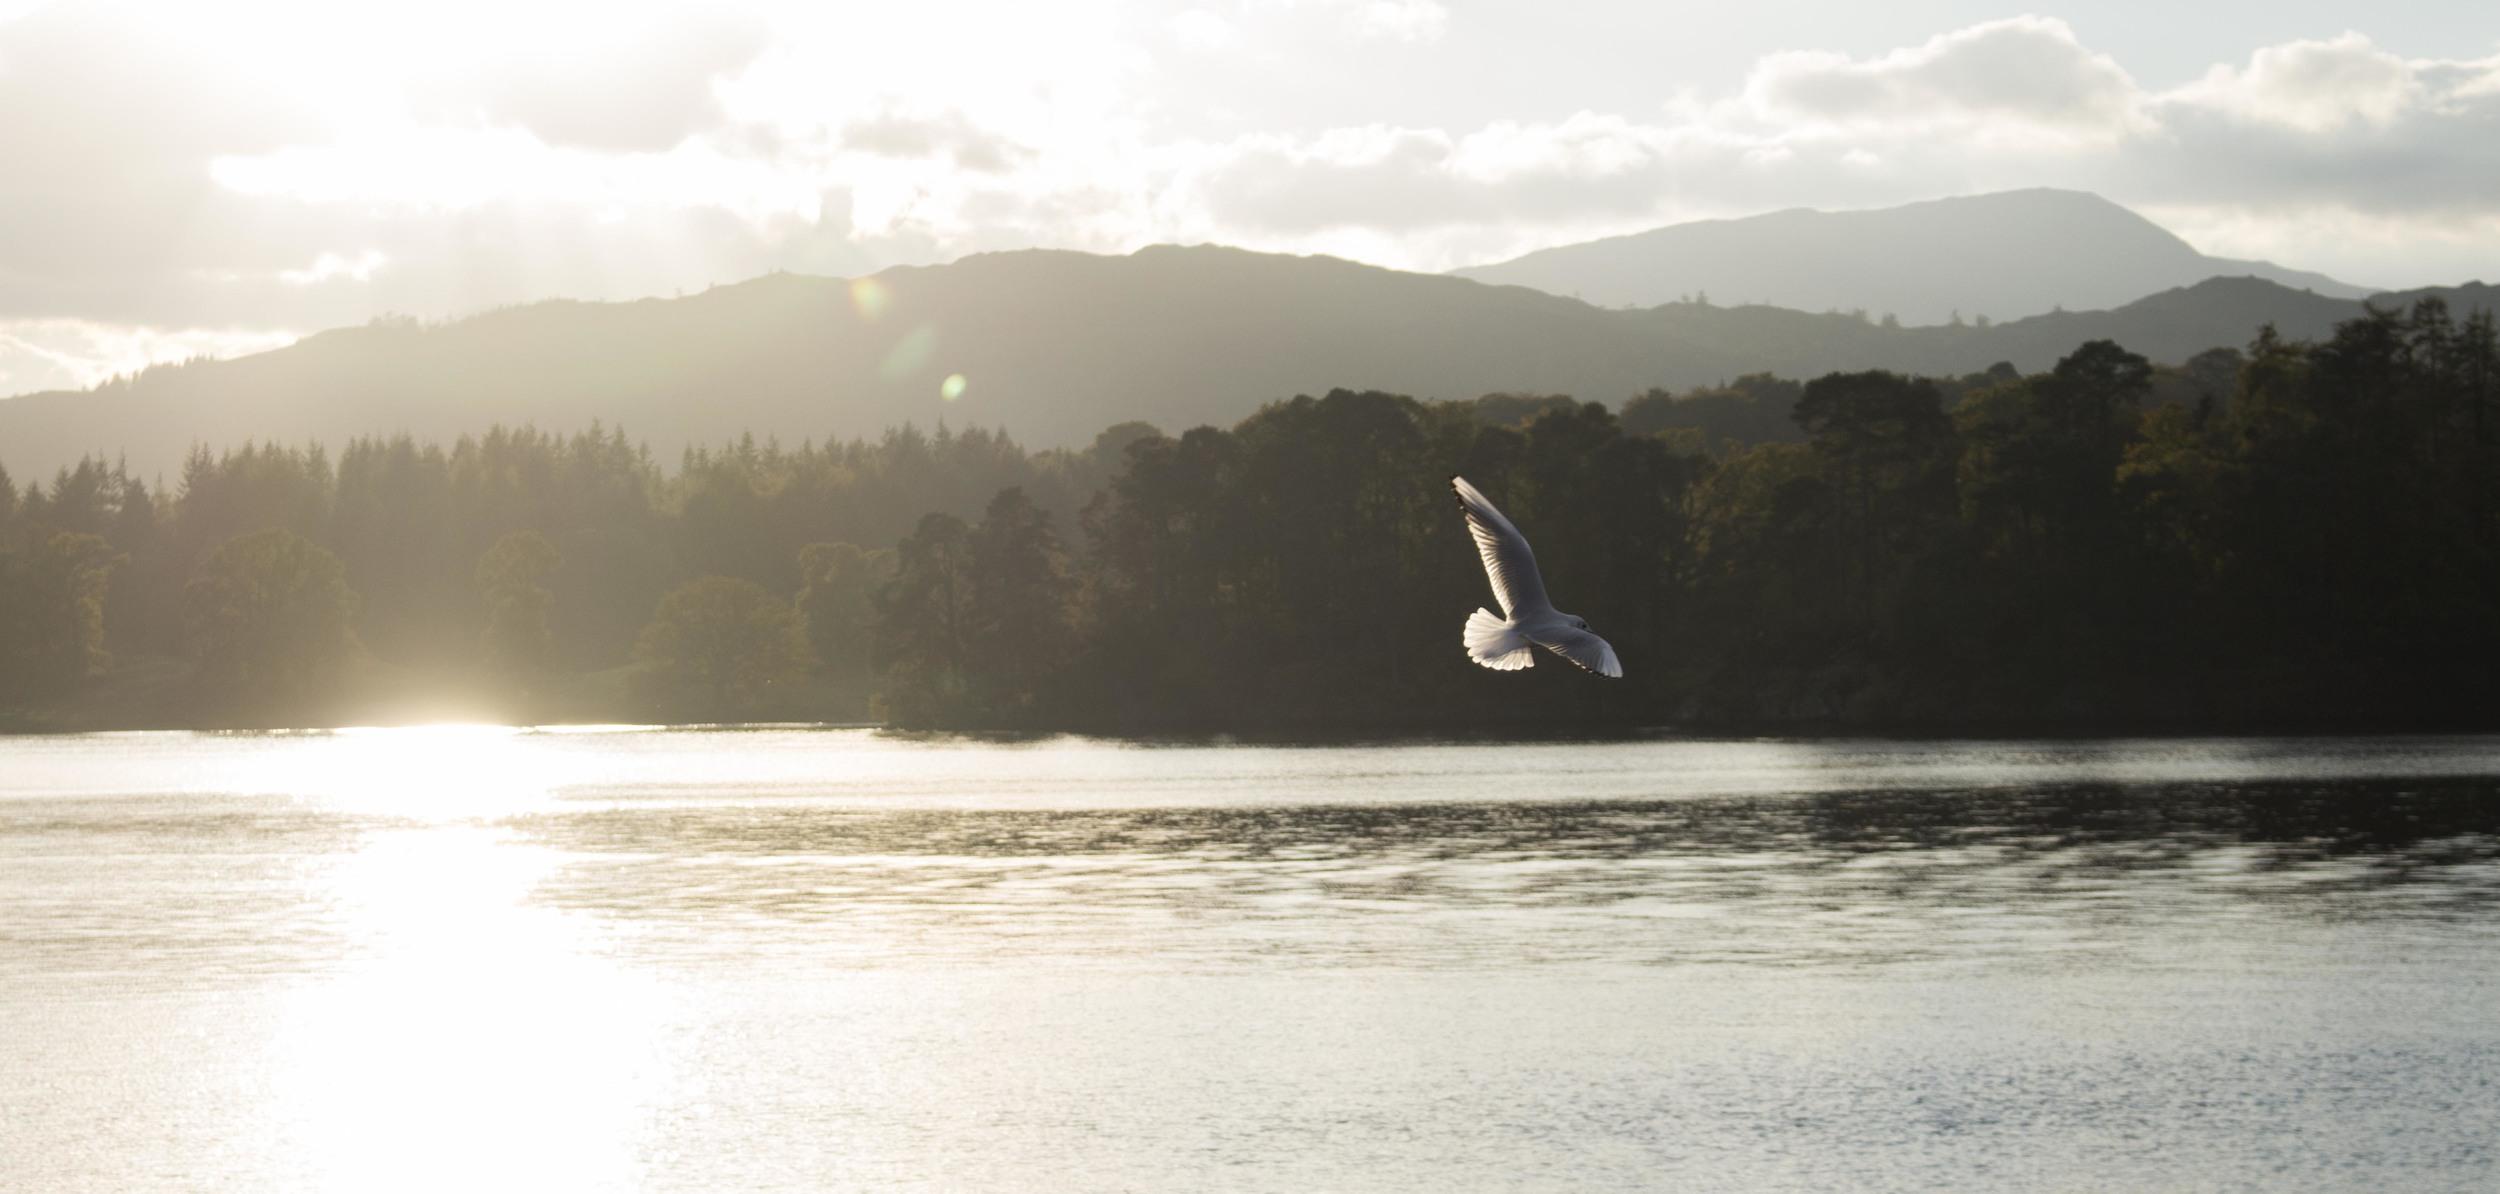 Photograph of Lake District